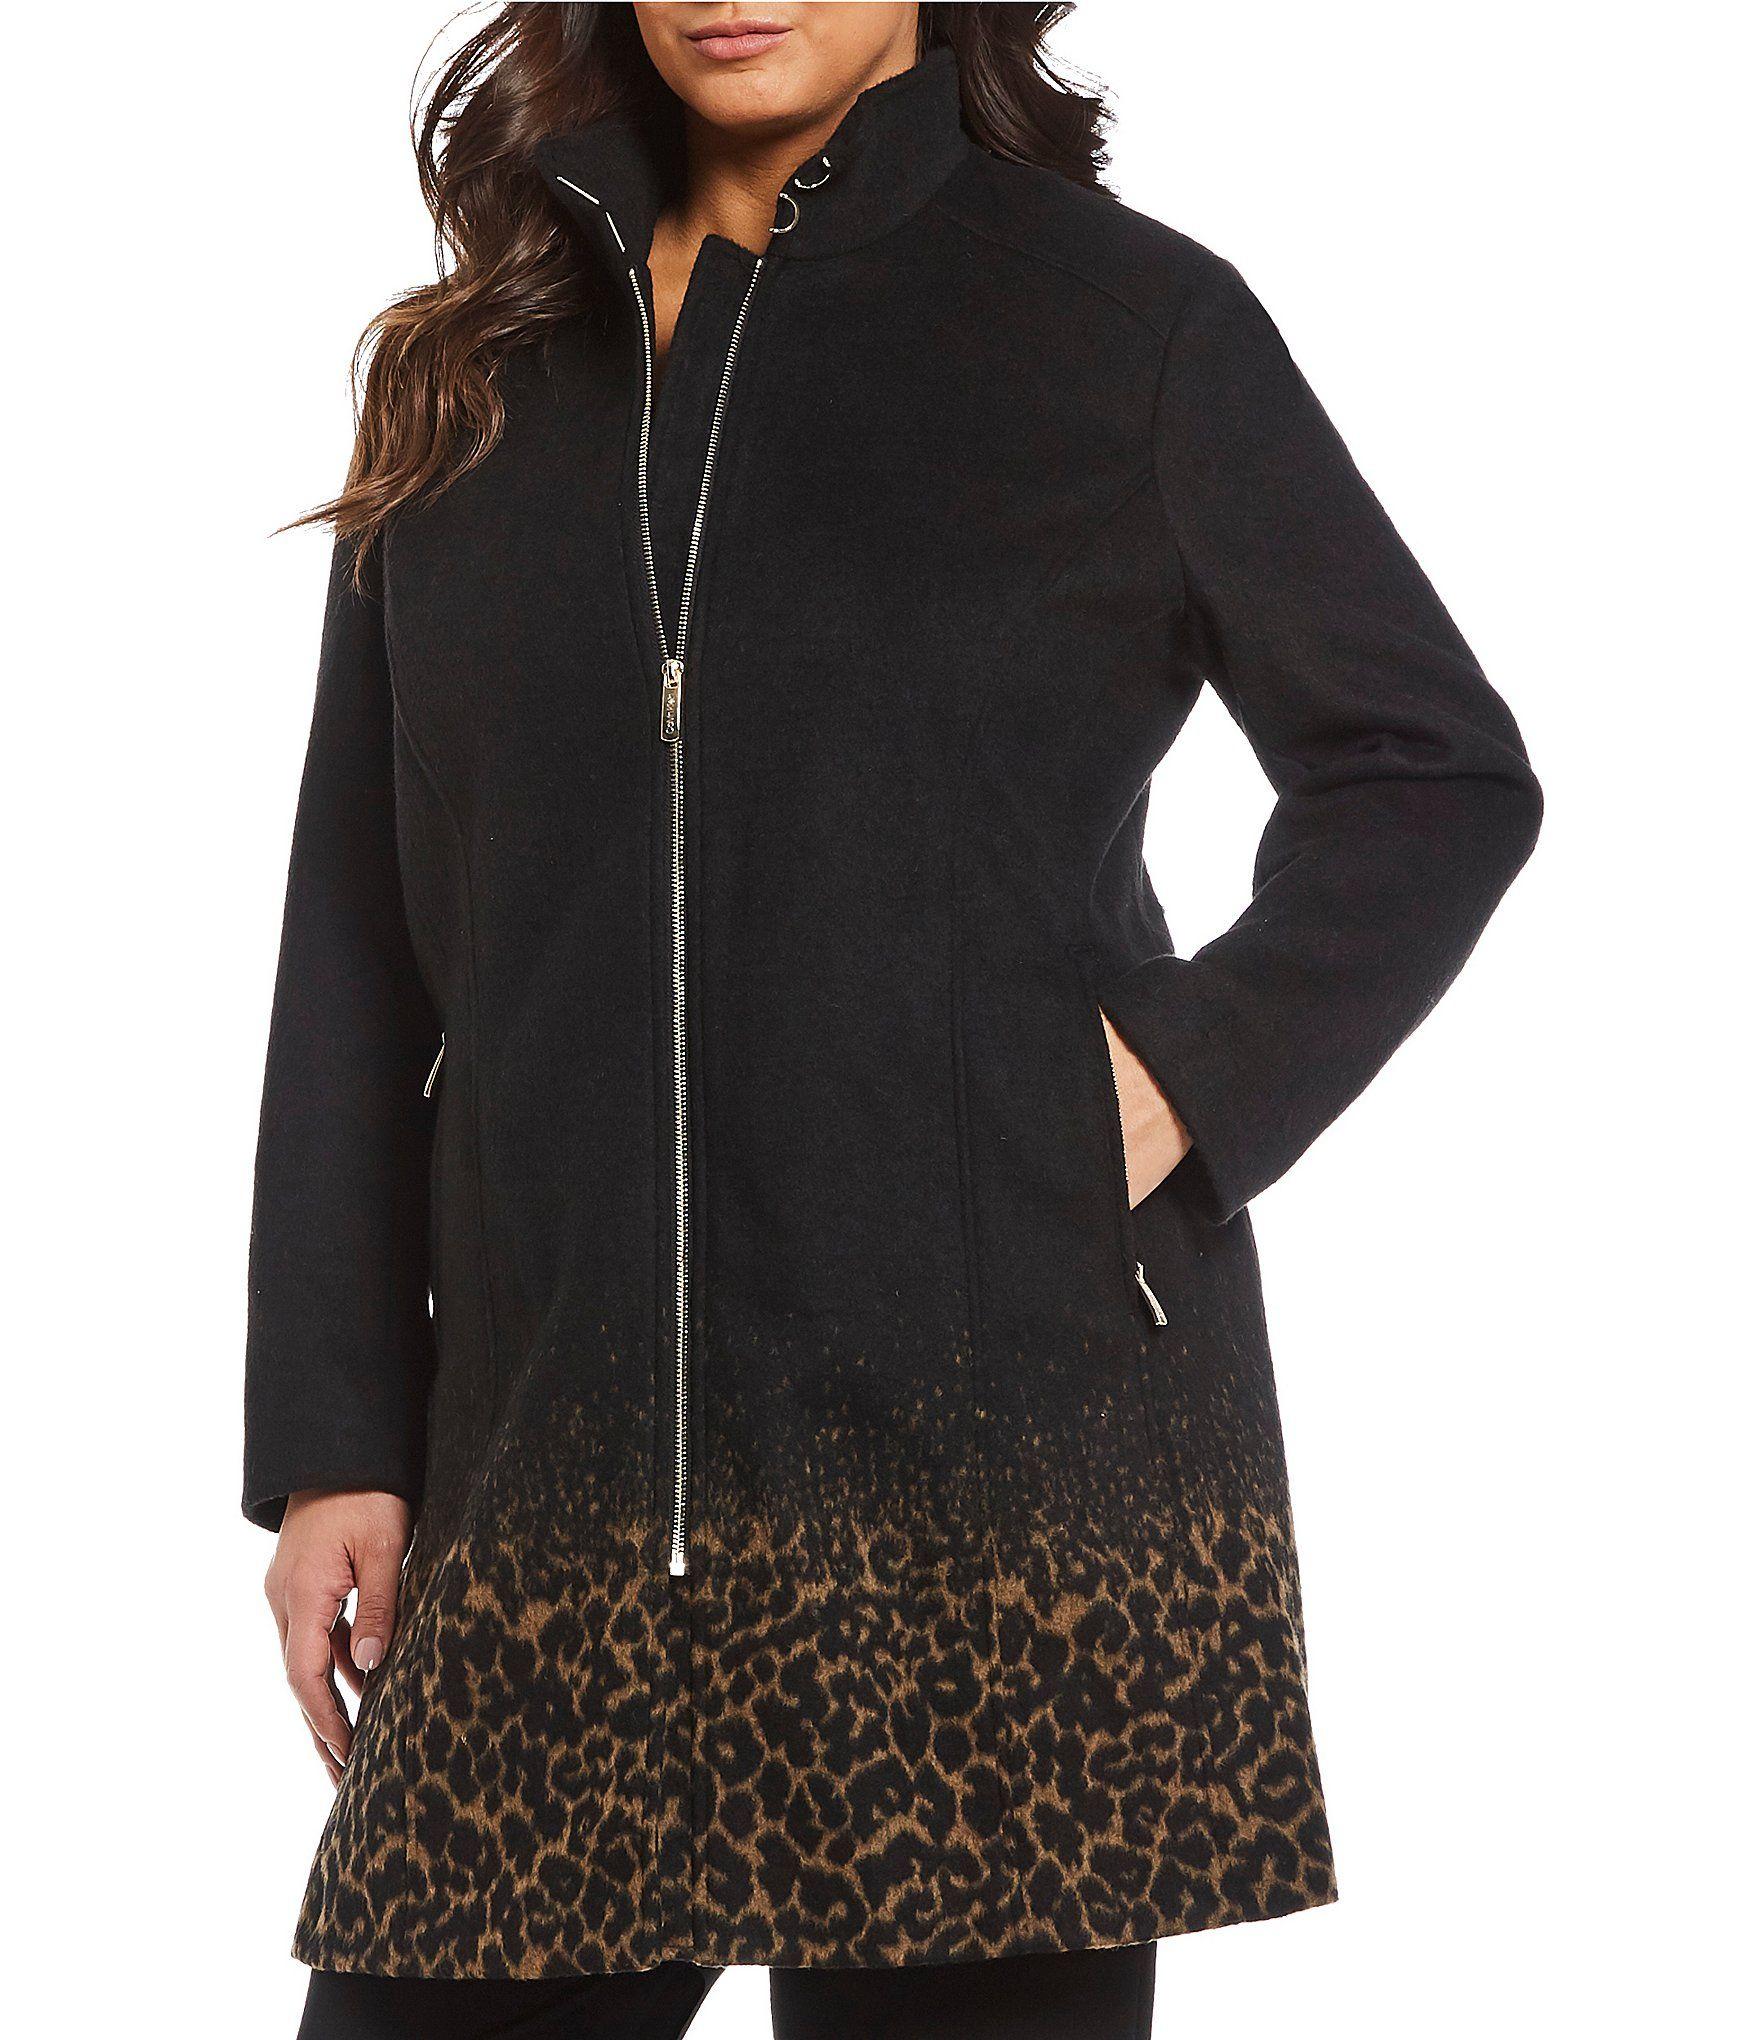 389ca799f94 Shop for Calvin Klein Plus Size Single Breast Leopard Print Walker Coat at  Dillards.com. Visit Dillards.com to find clothing